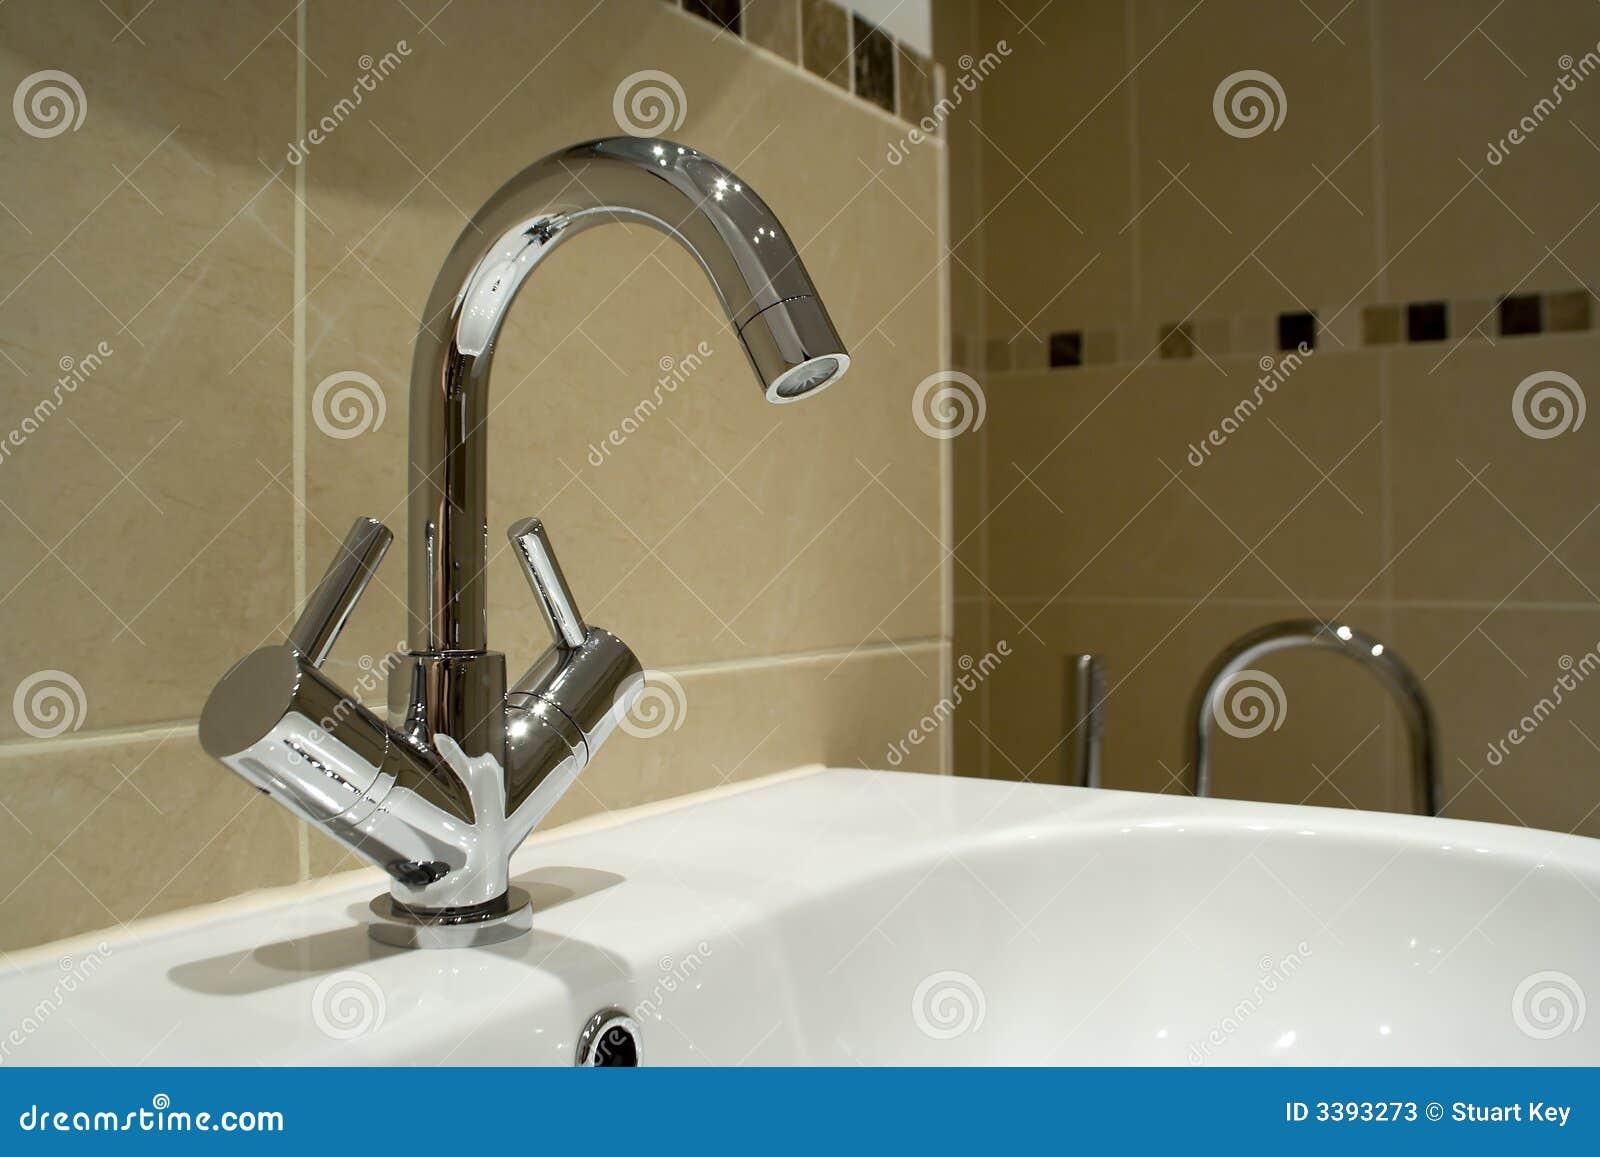 Cuarto De Baño Moderno Fotos:Cuarto De Baño Moderno Fotos de archivo – Imagen: 3393273